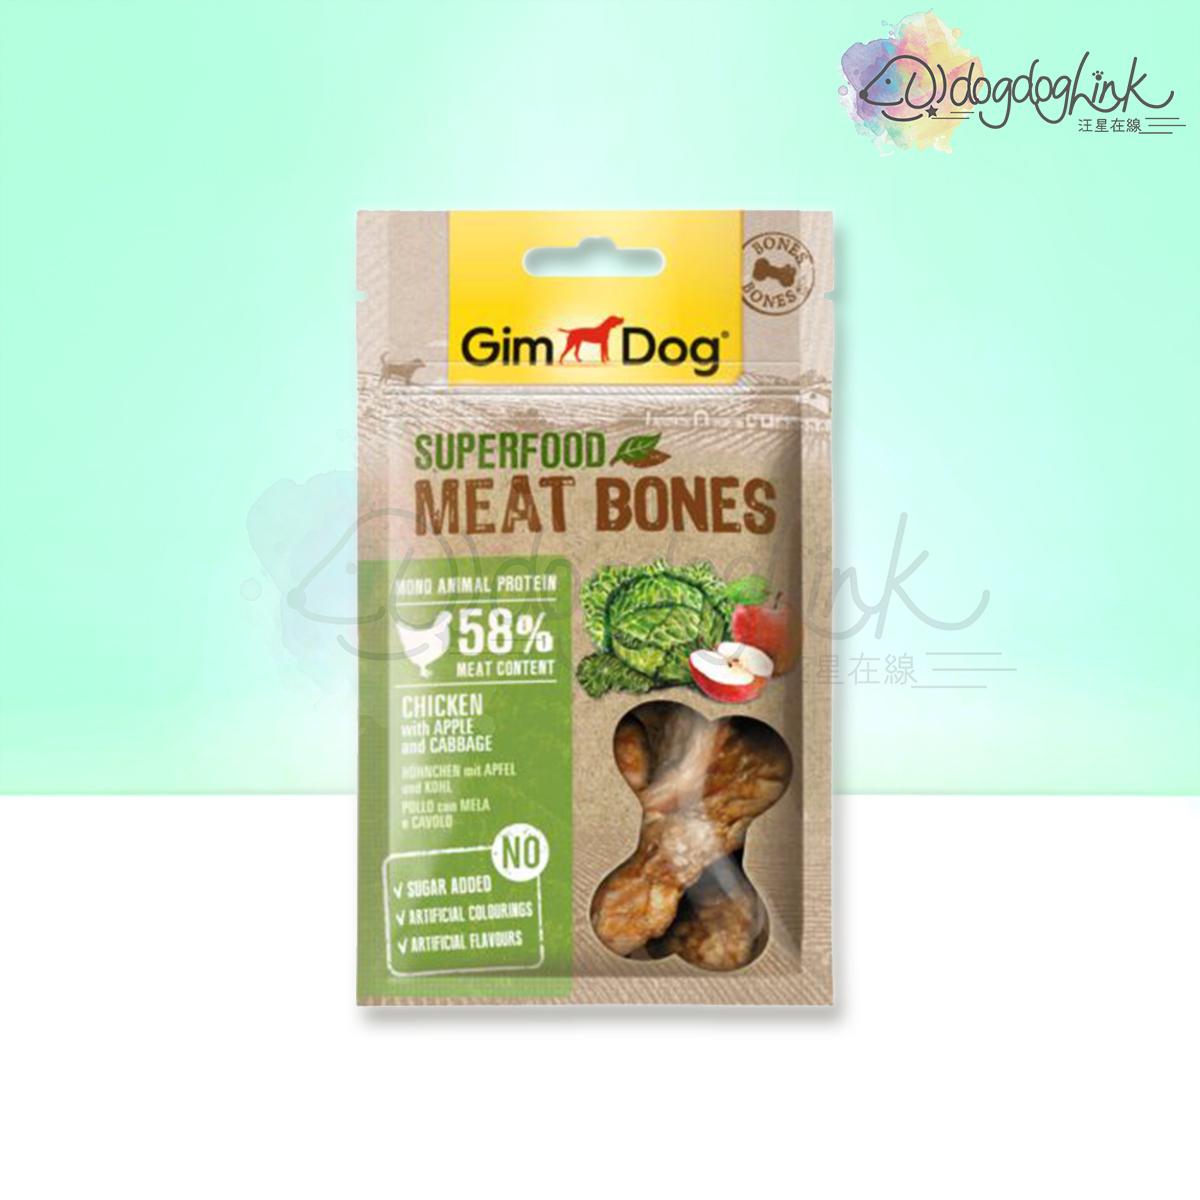 Meat Bones Chicken with Apple & Cabbage 70g